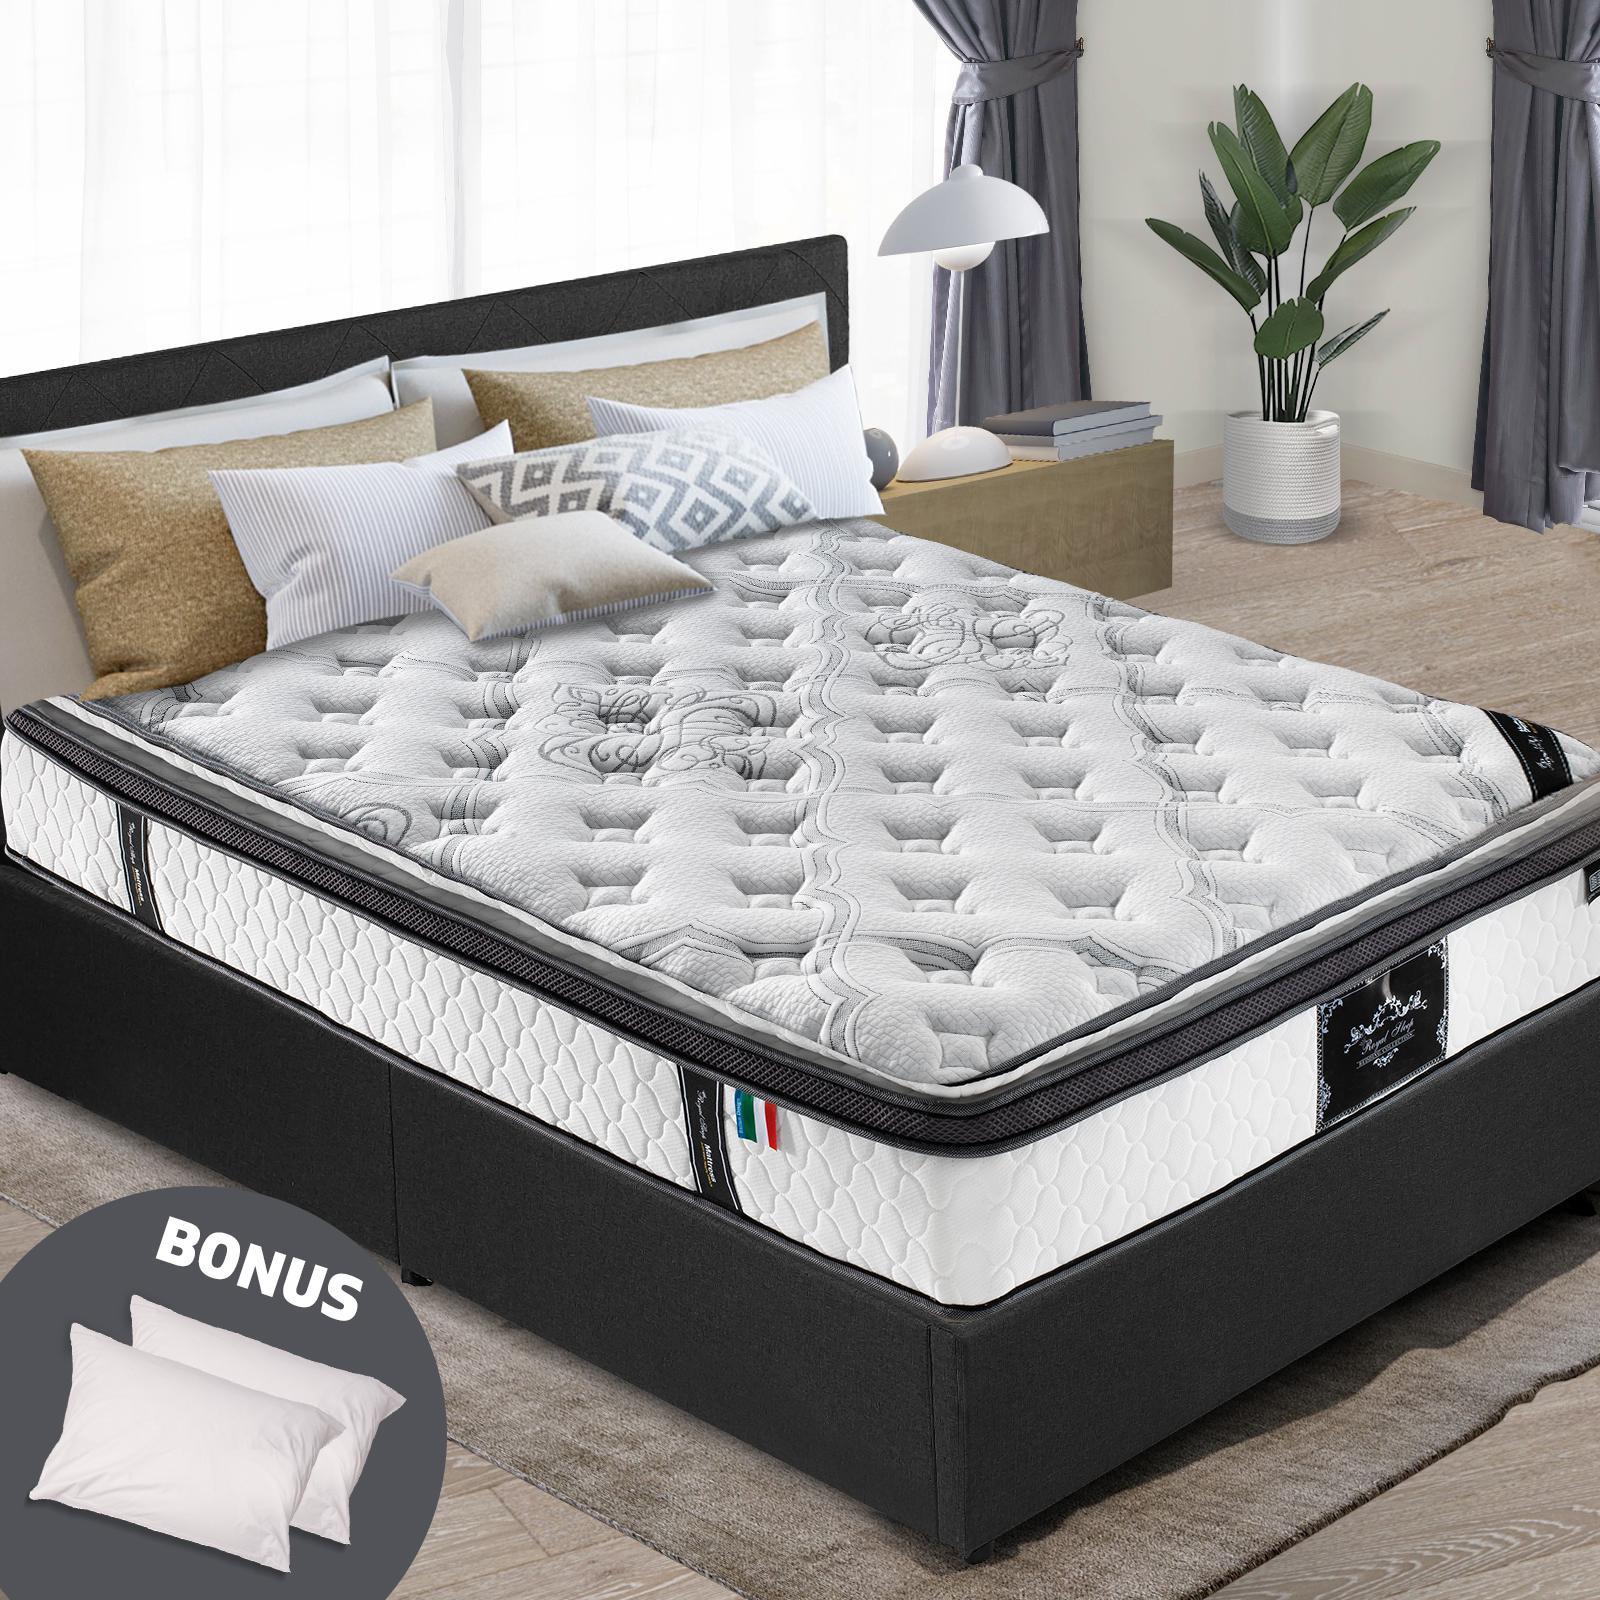 king mattress euro and pillow top 9 zone pocket spring latex memory foam 34cm